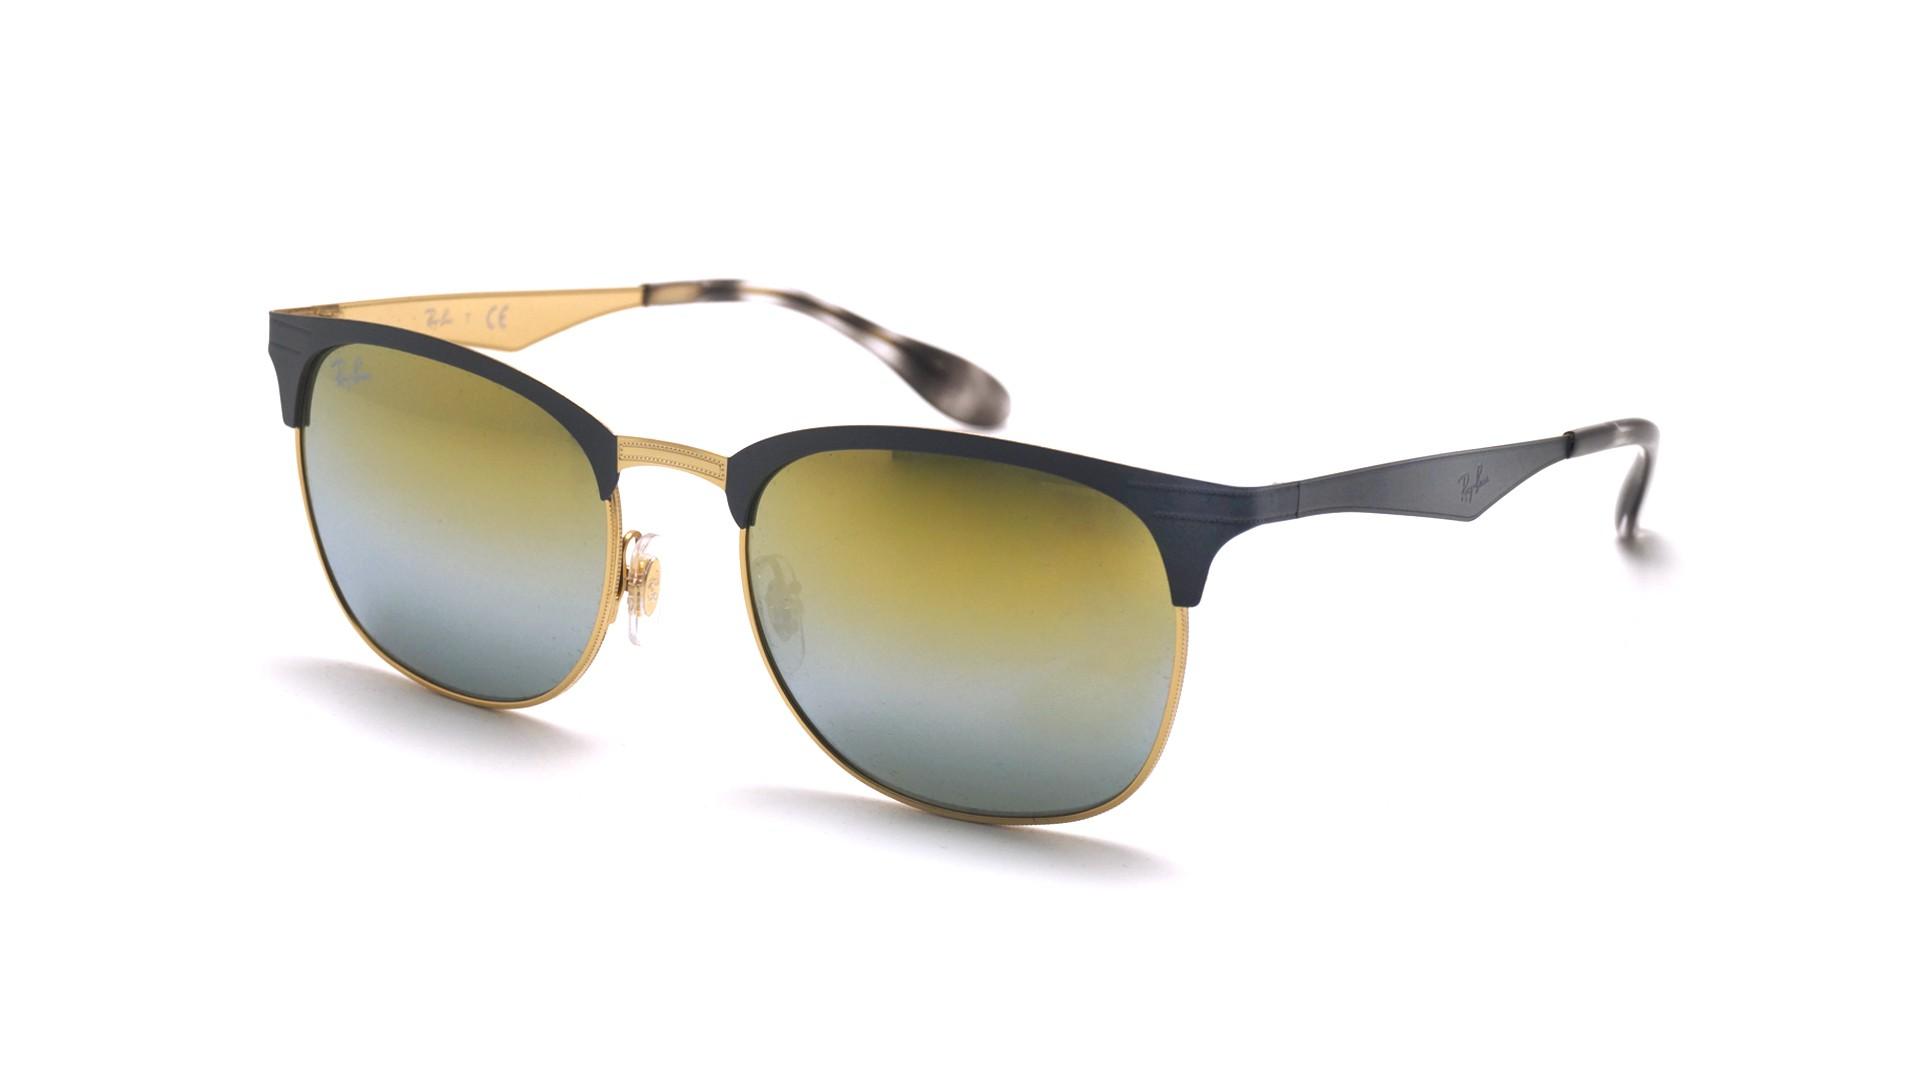 bb66f97570 Sunglasses Ray-Ban RB3538 9007 A7 53-19 Grey Matte Medium Gradient Mirror